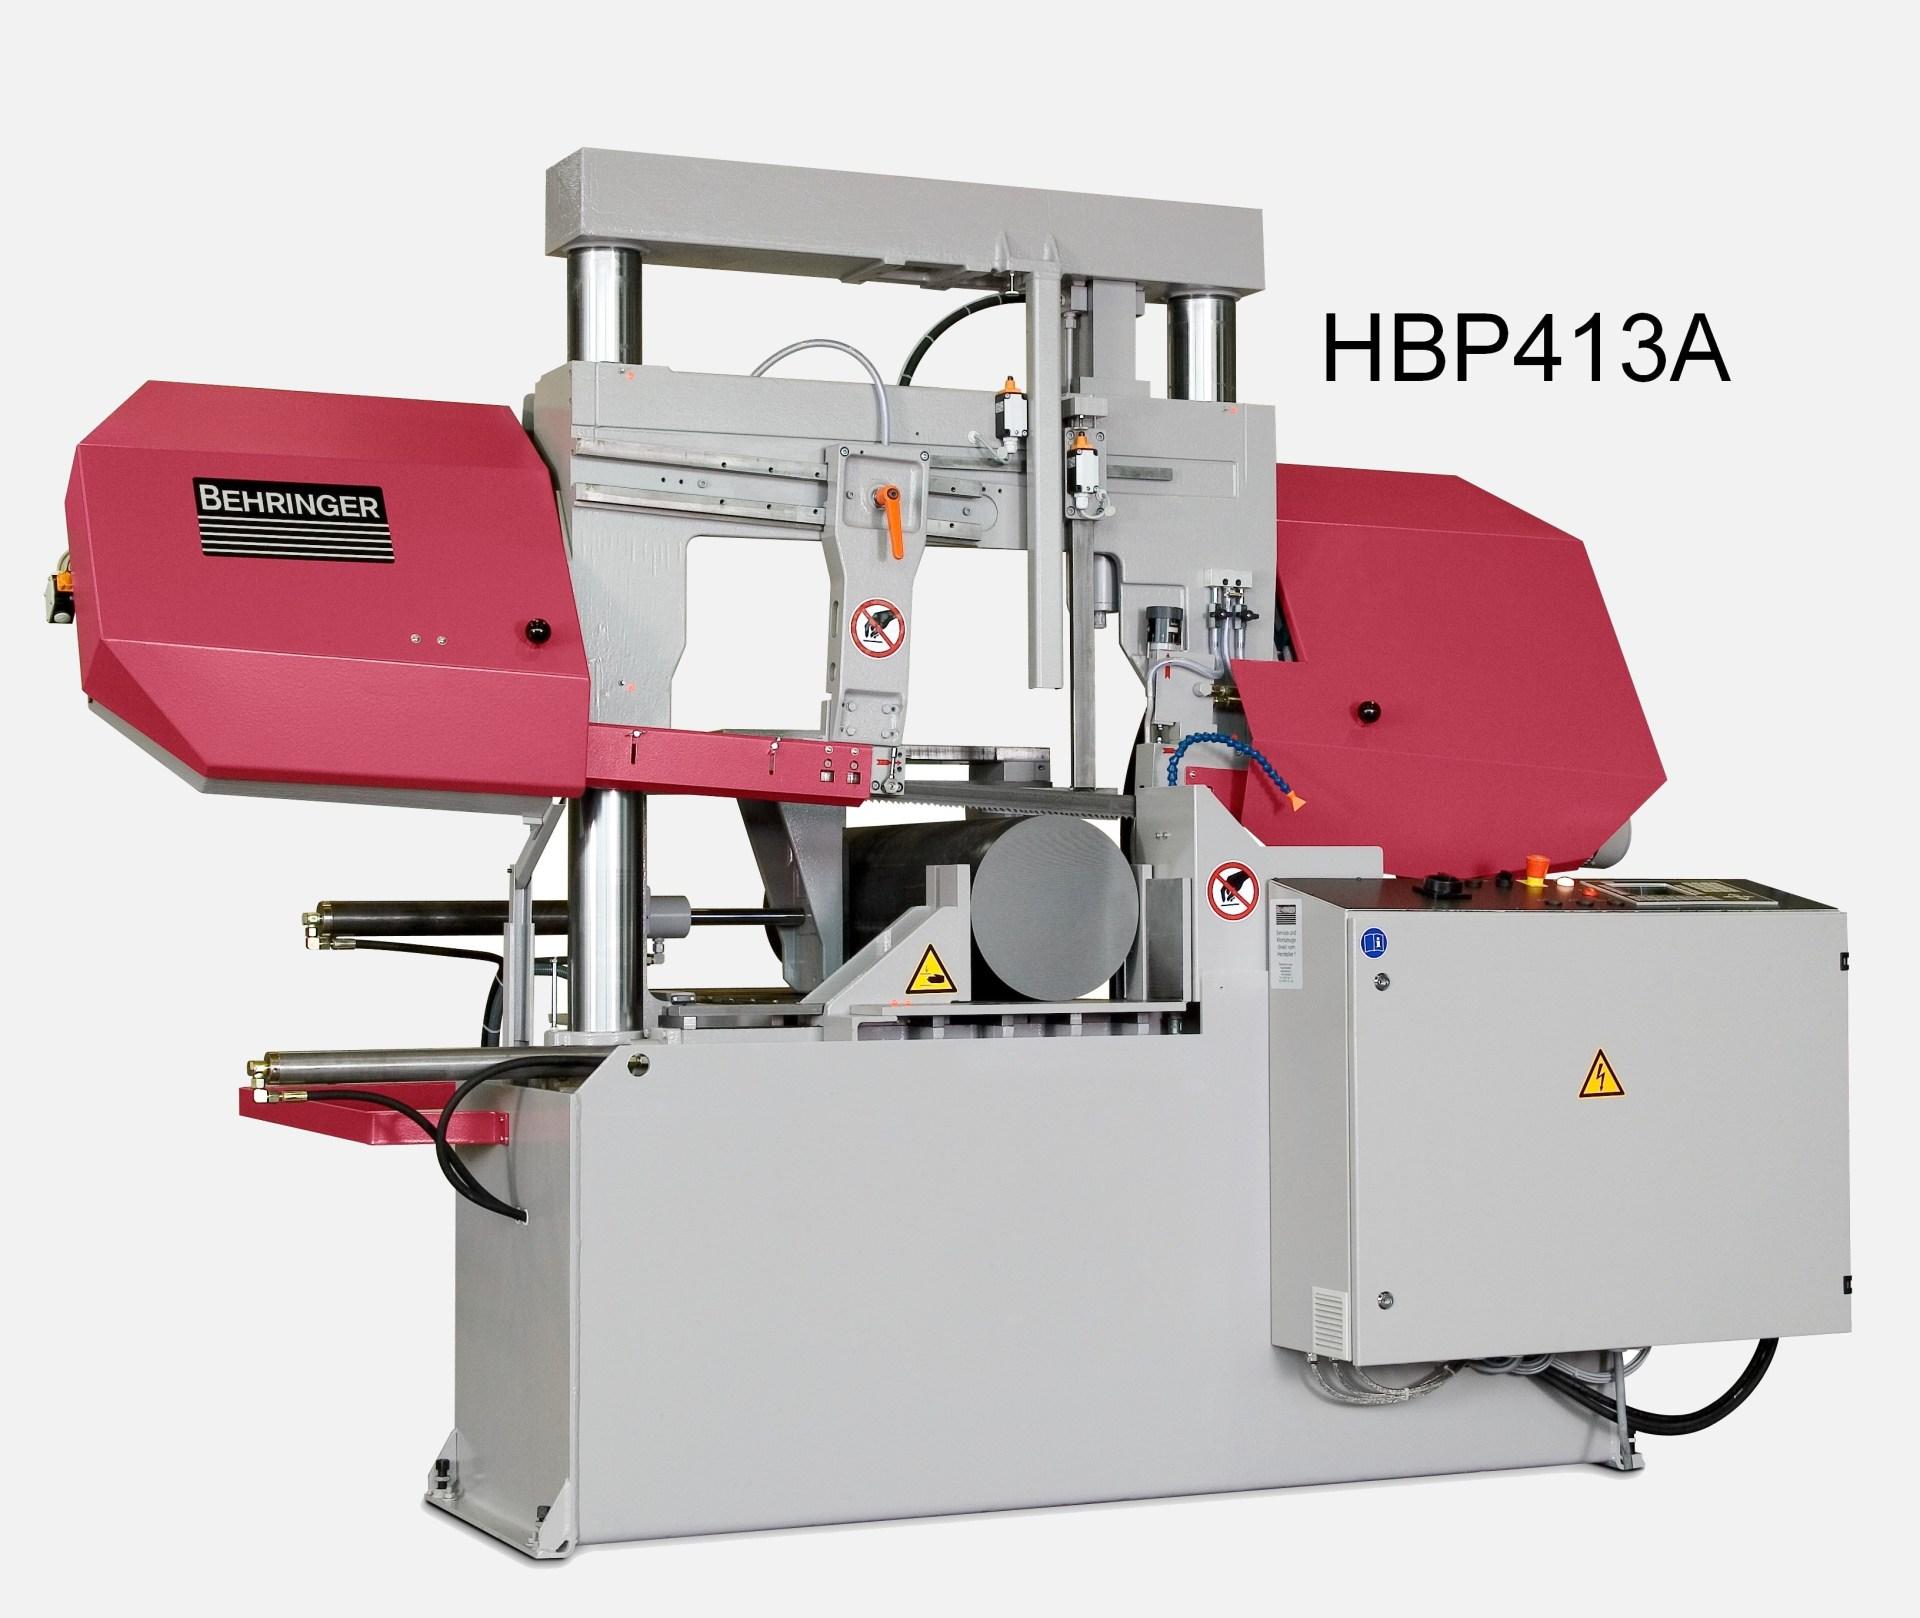 HBP 413A